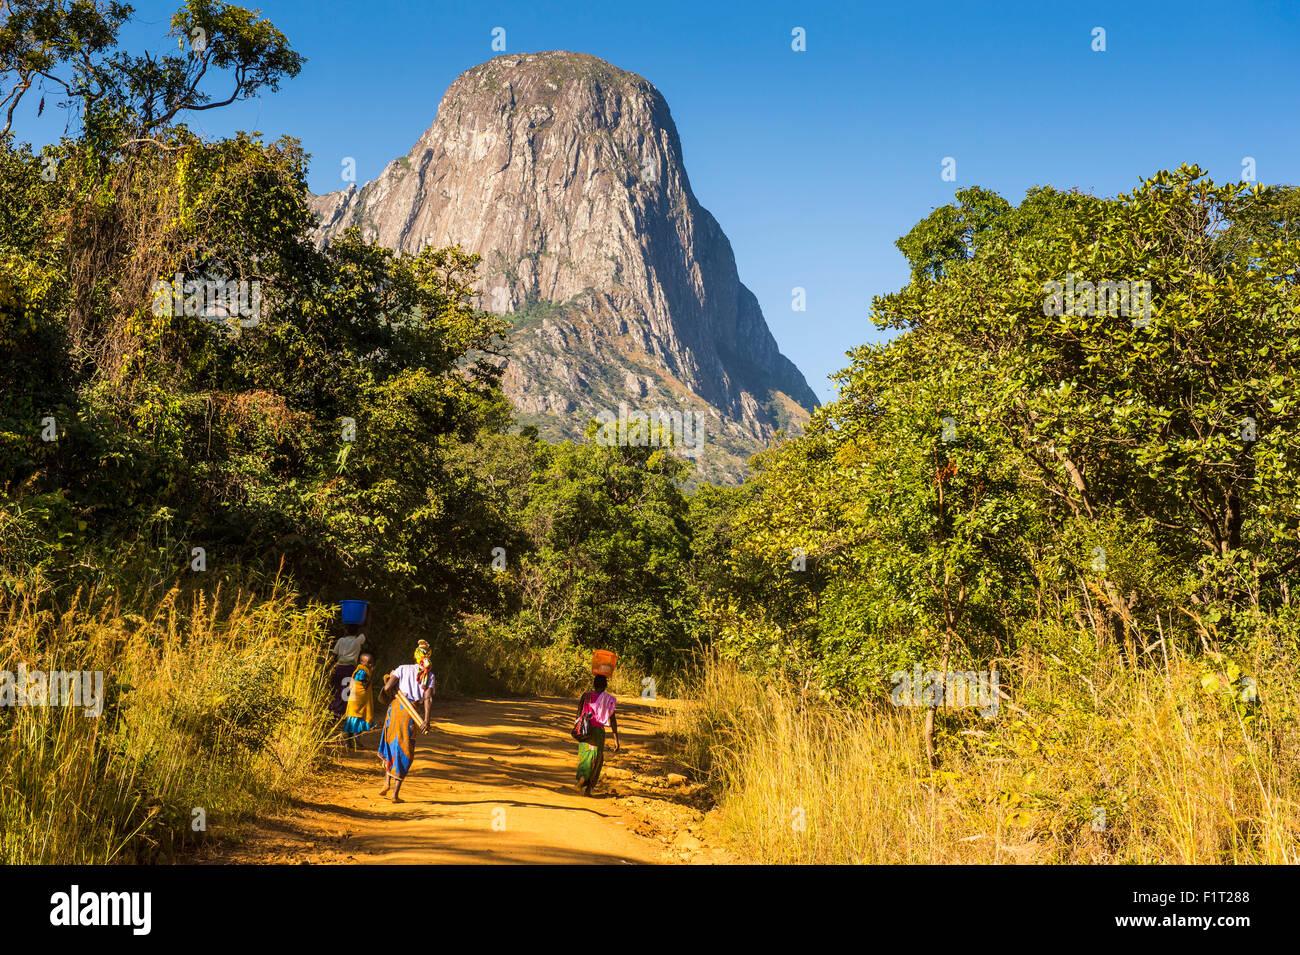 Staubige Strecke Laeding die Granit-Gipfel des Mount Mulanje, Malawi, Afrika Stockbild